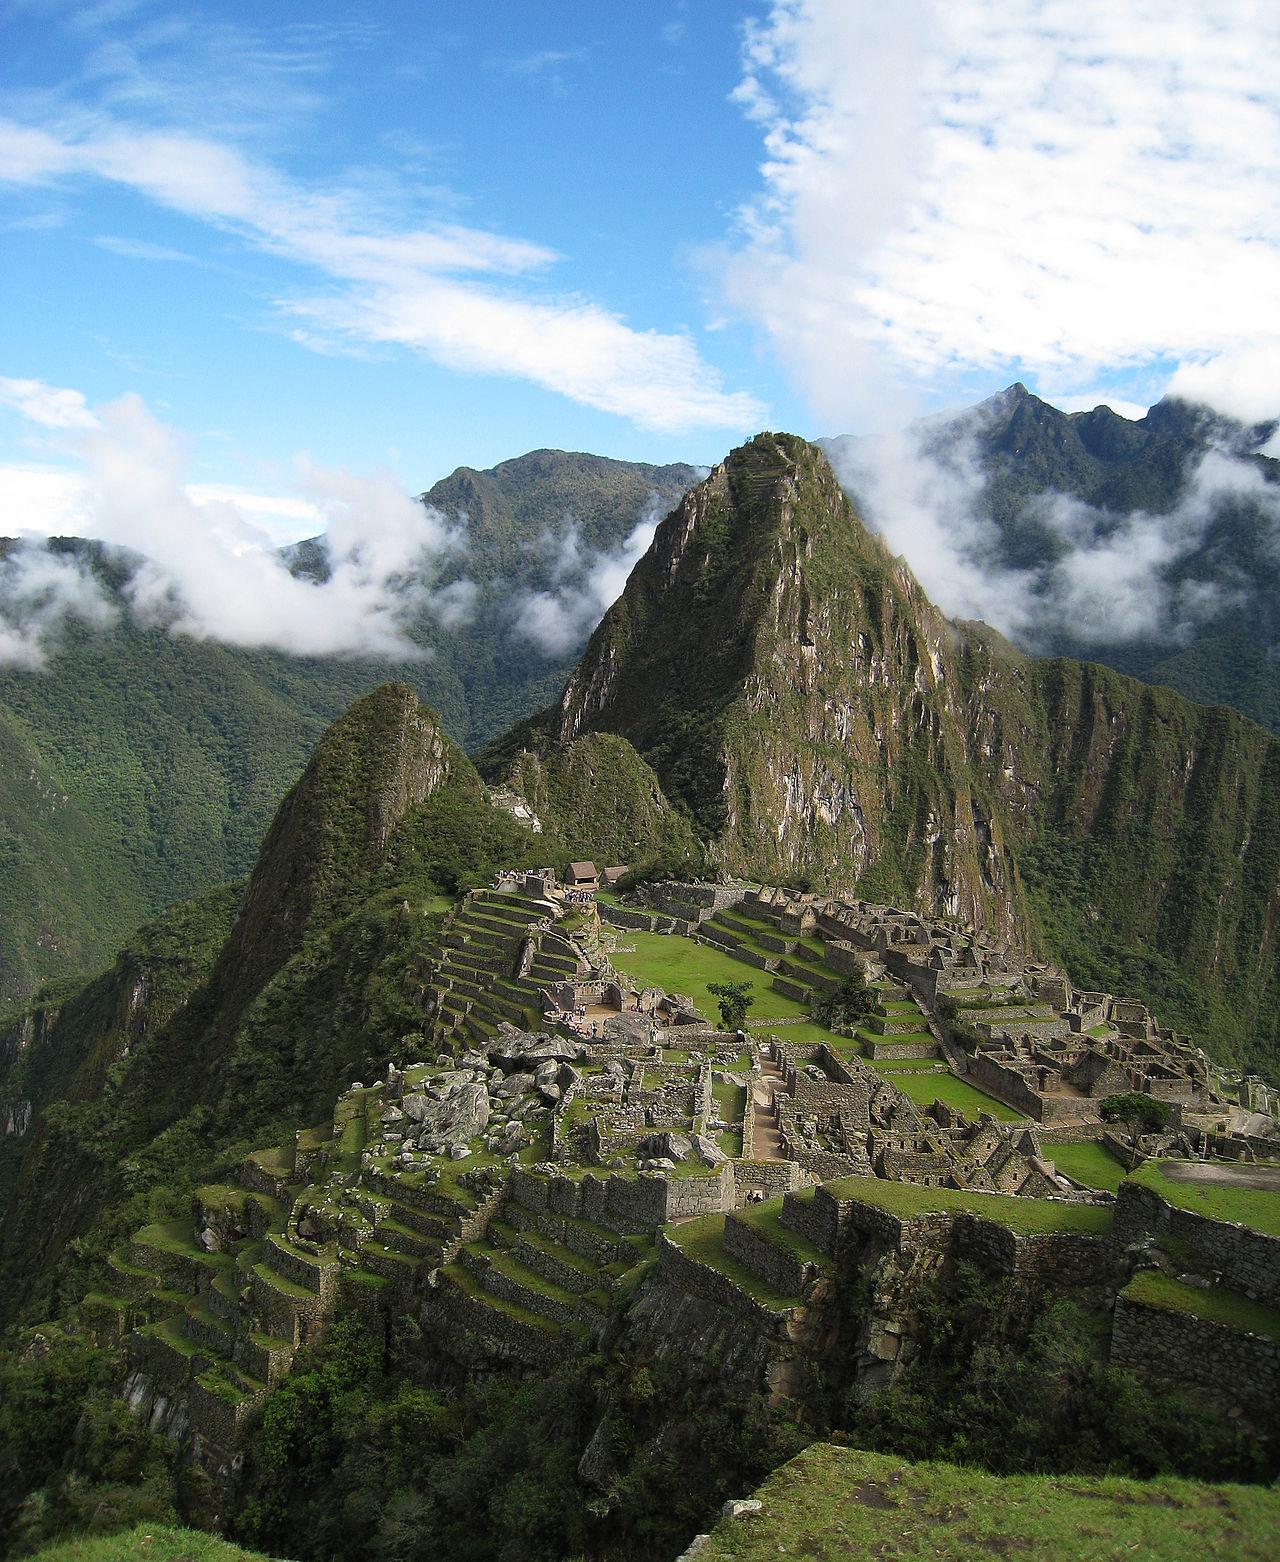 [Image: 1280px-Over_Machu_Picchu.jpg]